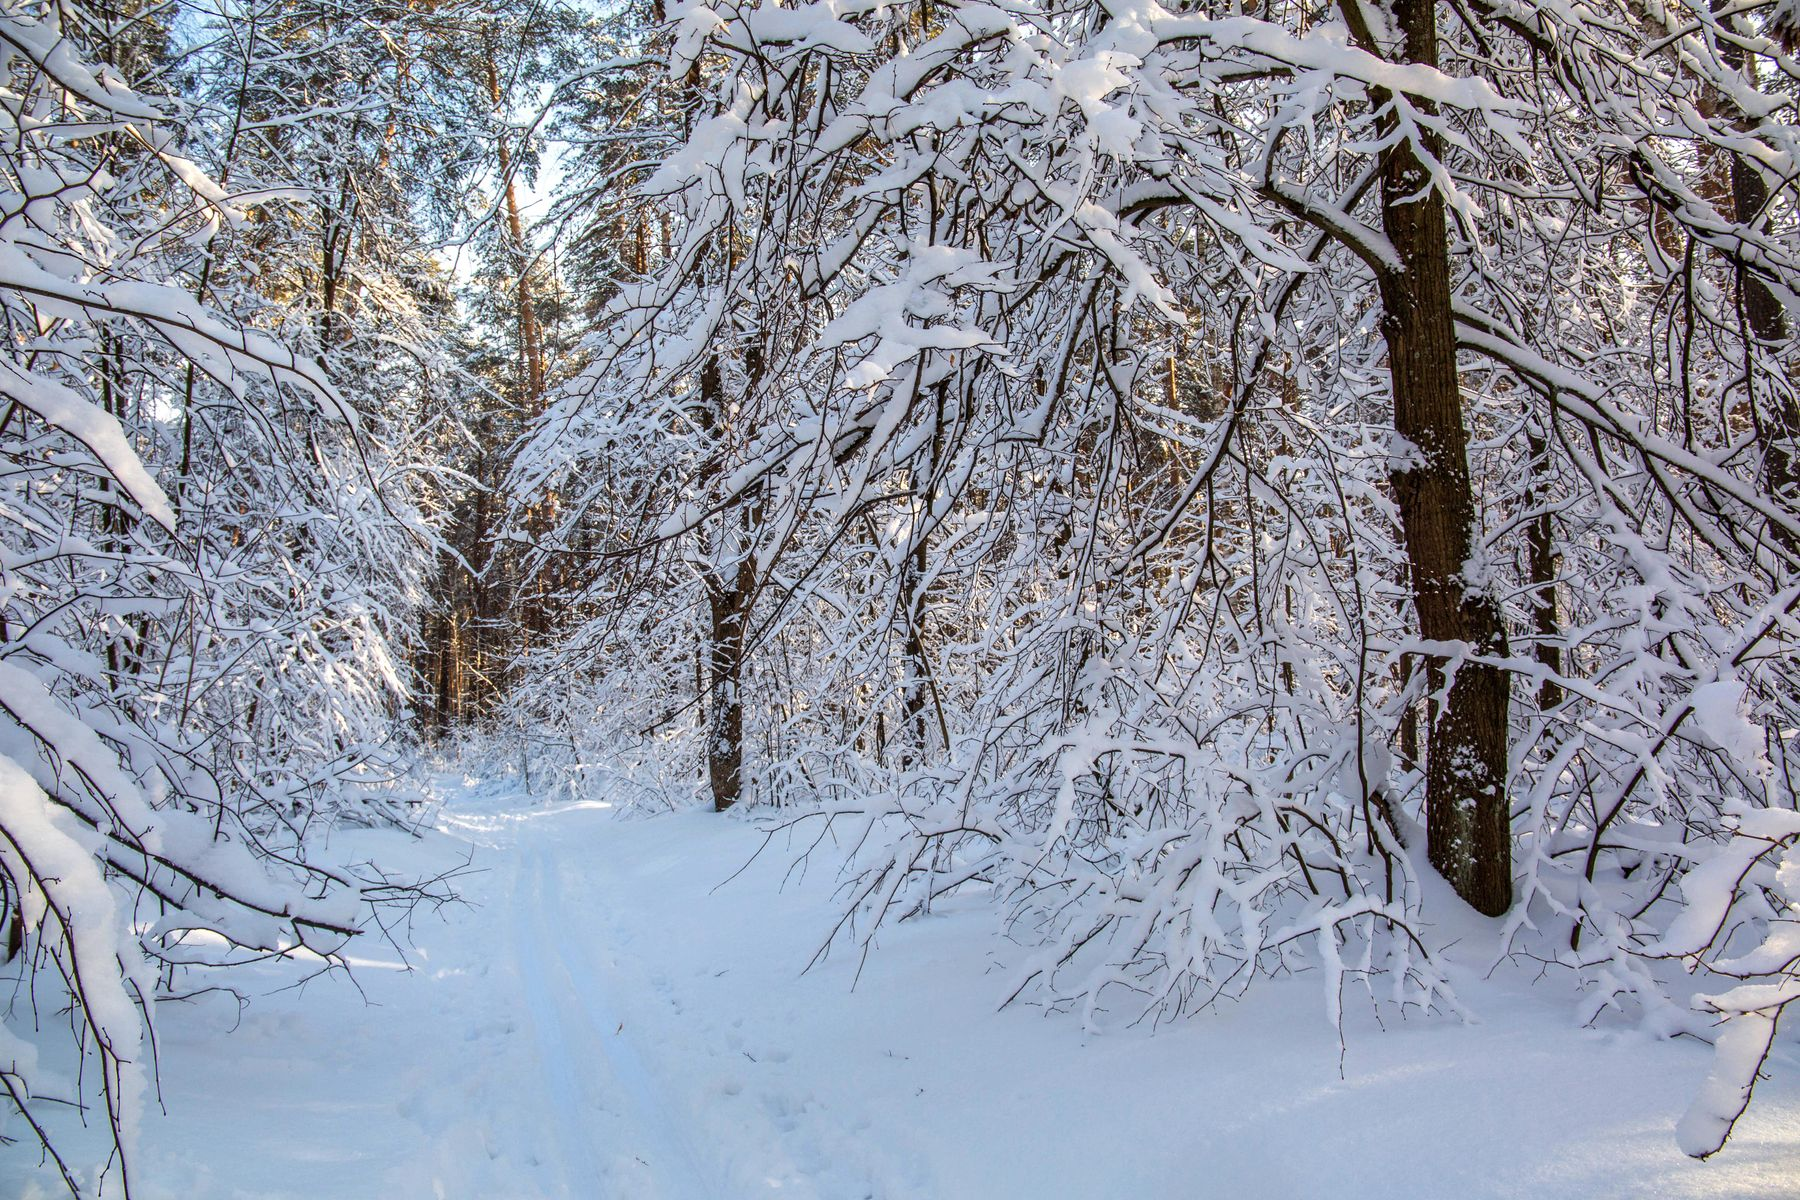 Снежный лес природа пейзаж зима лес татарстан лесопарк лебяжье